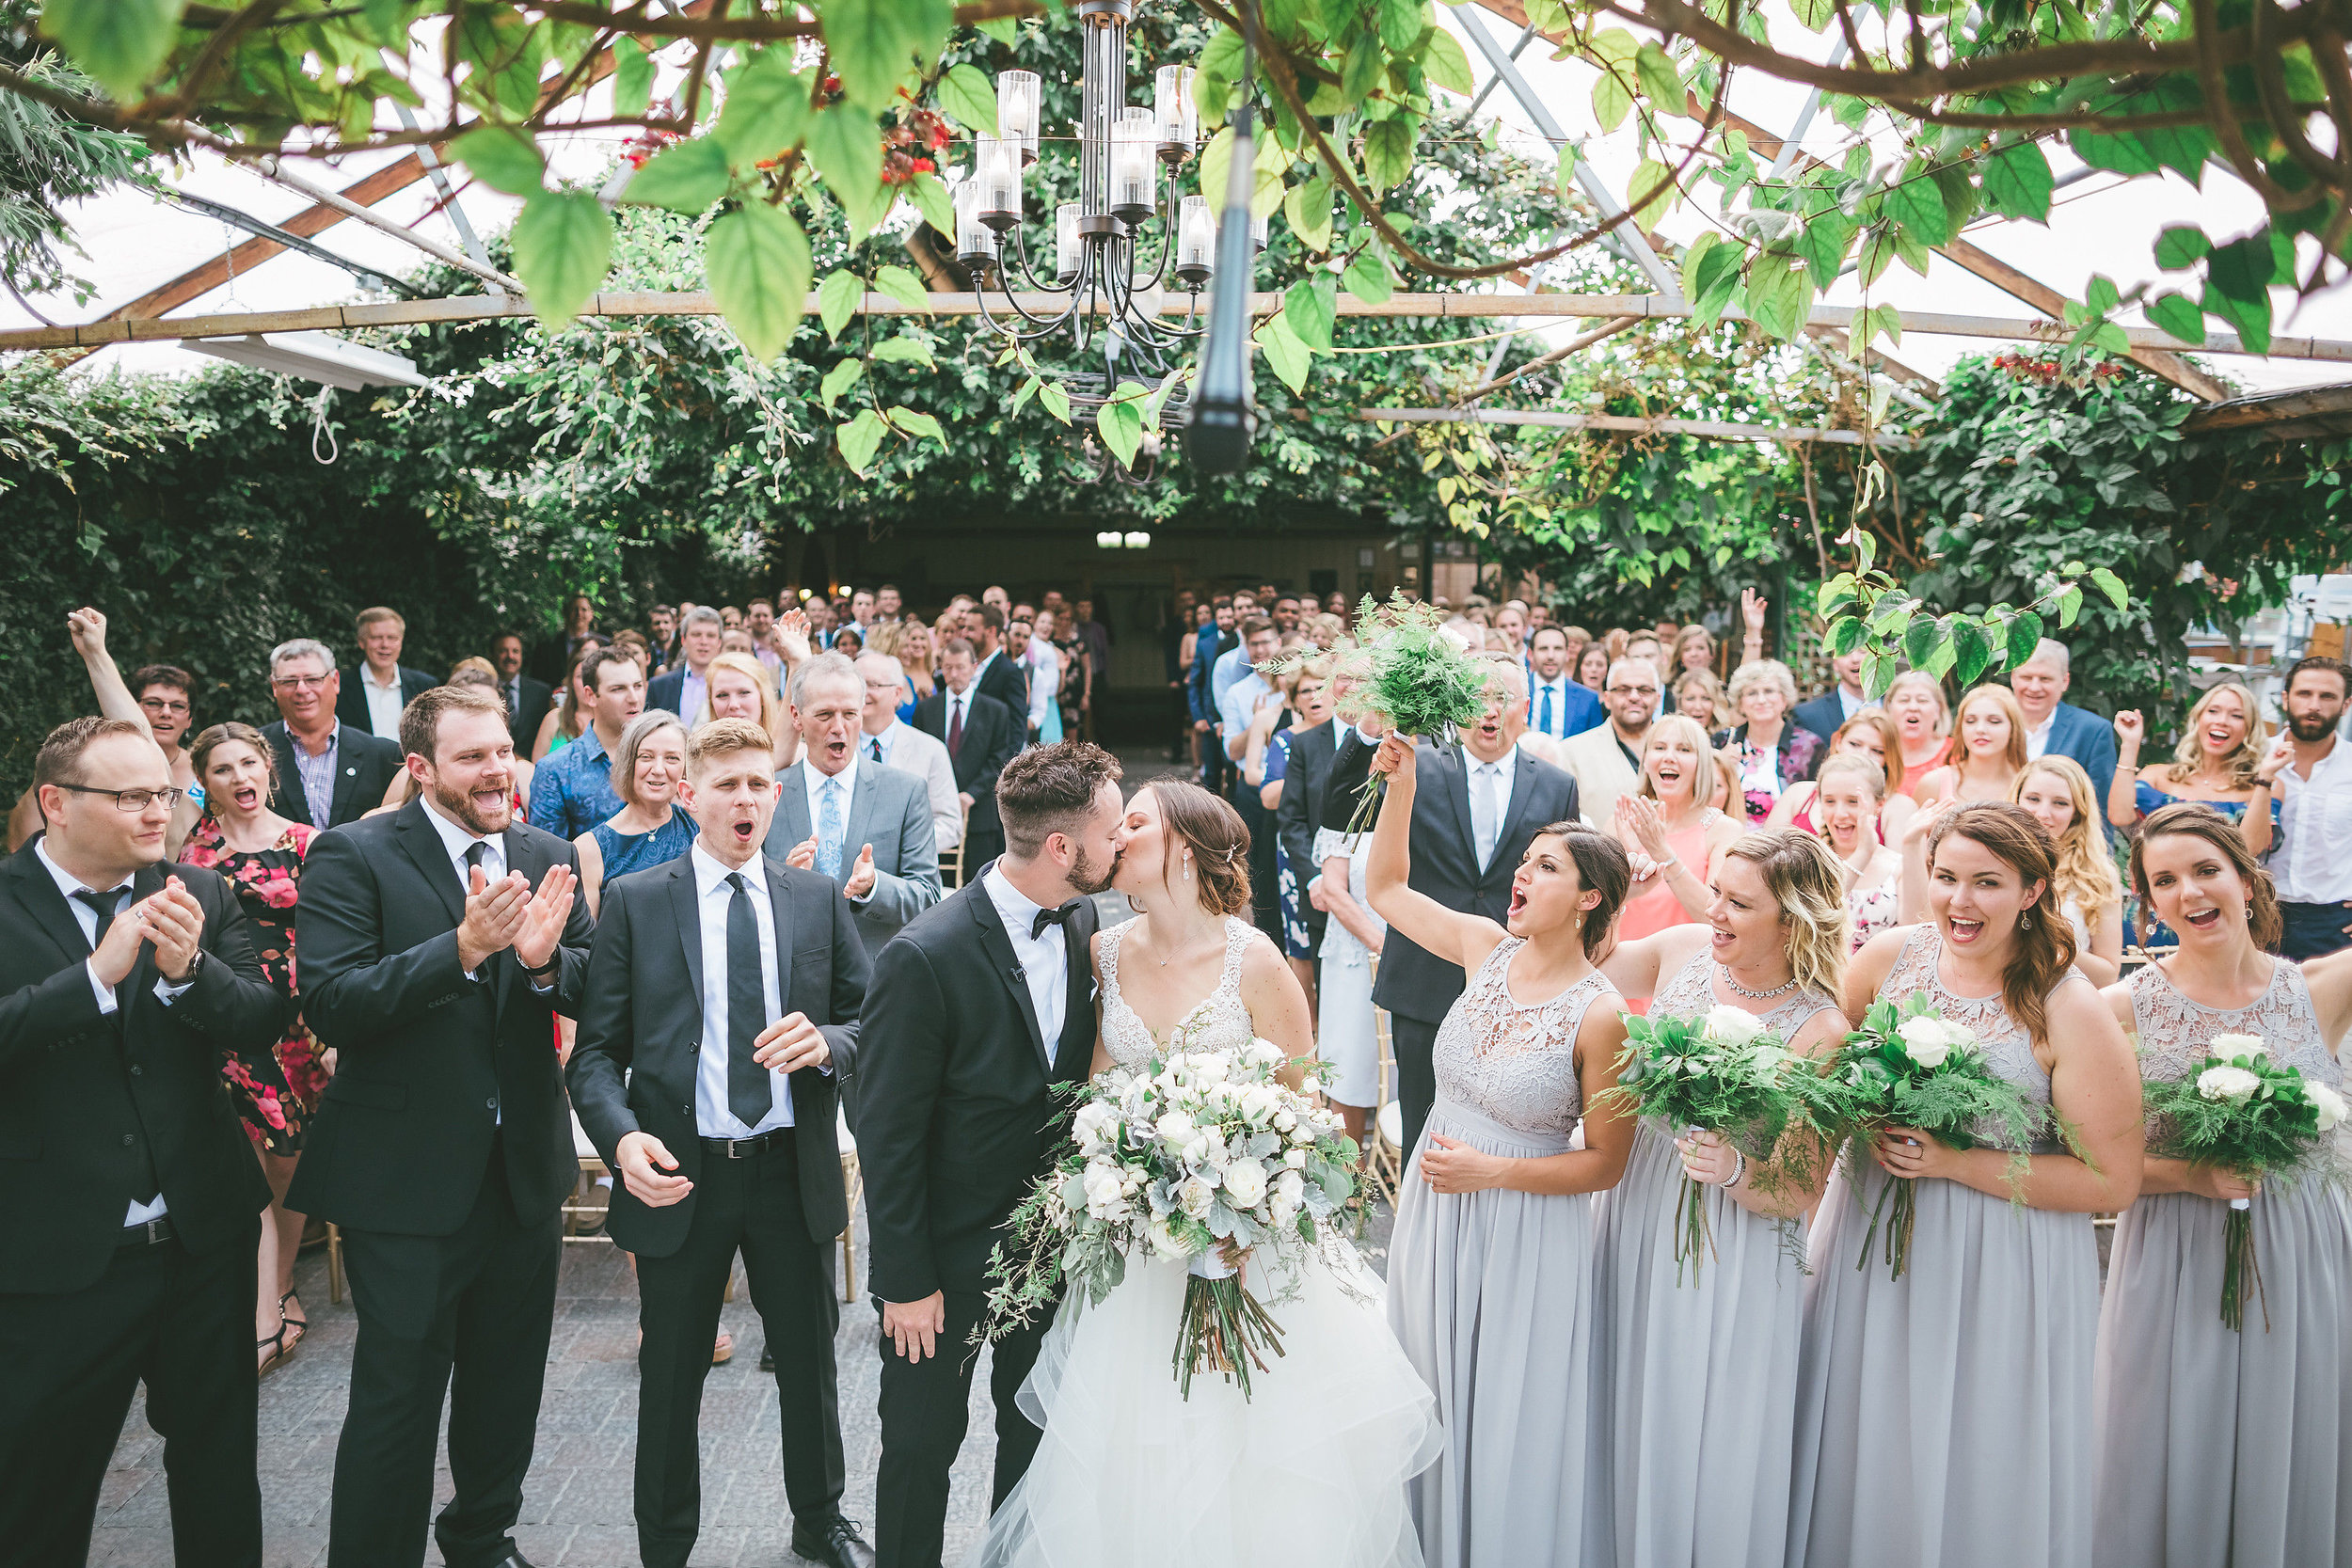 gosia___mike_wedding___lifesreel_danielcaruso___0810.jpg